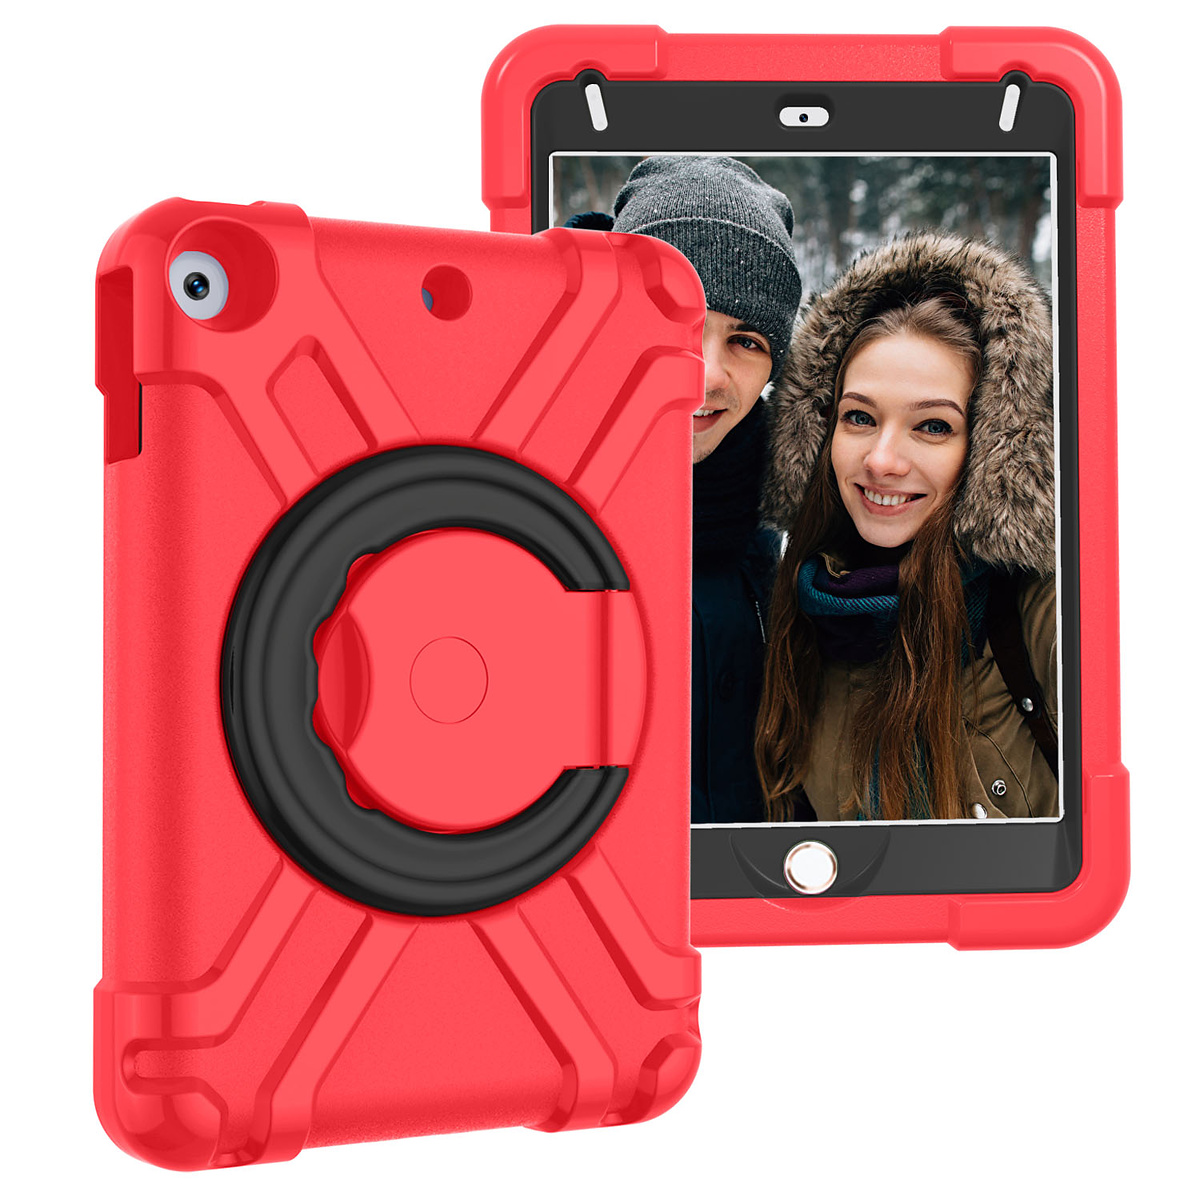 Barnfodral med roterbart ställ, iPad mini 4/5, röd/svart